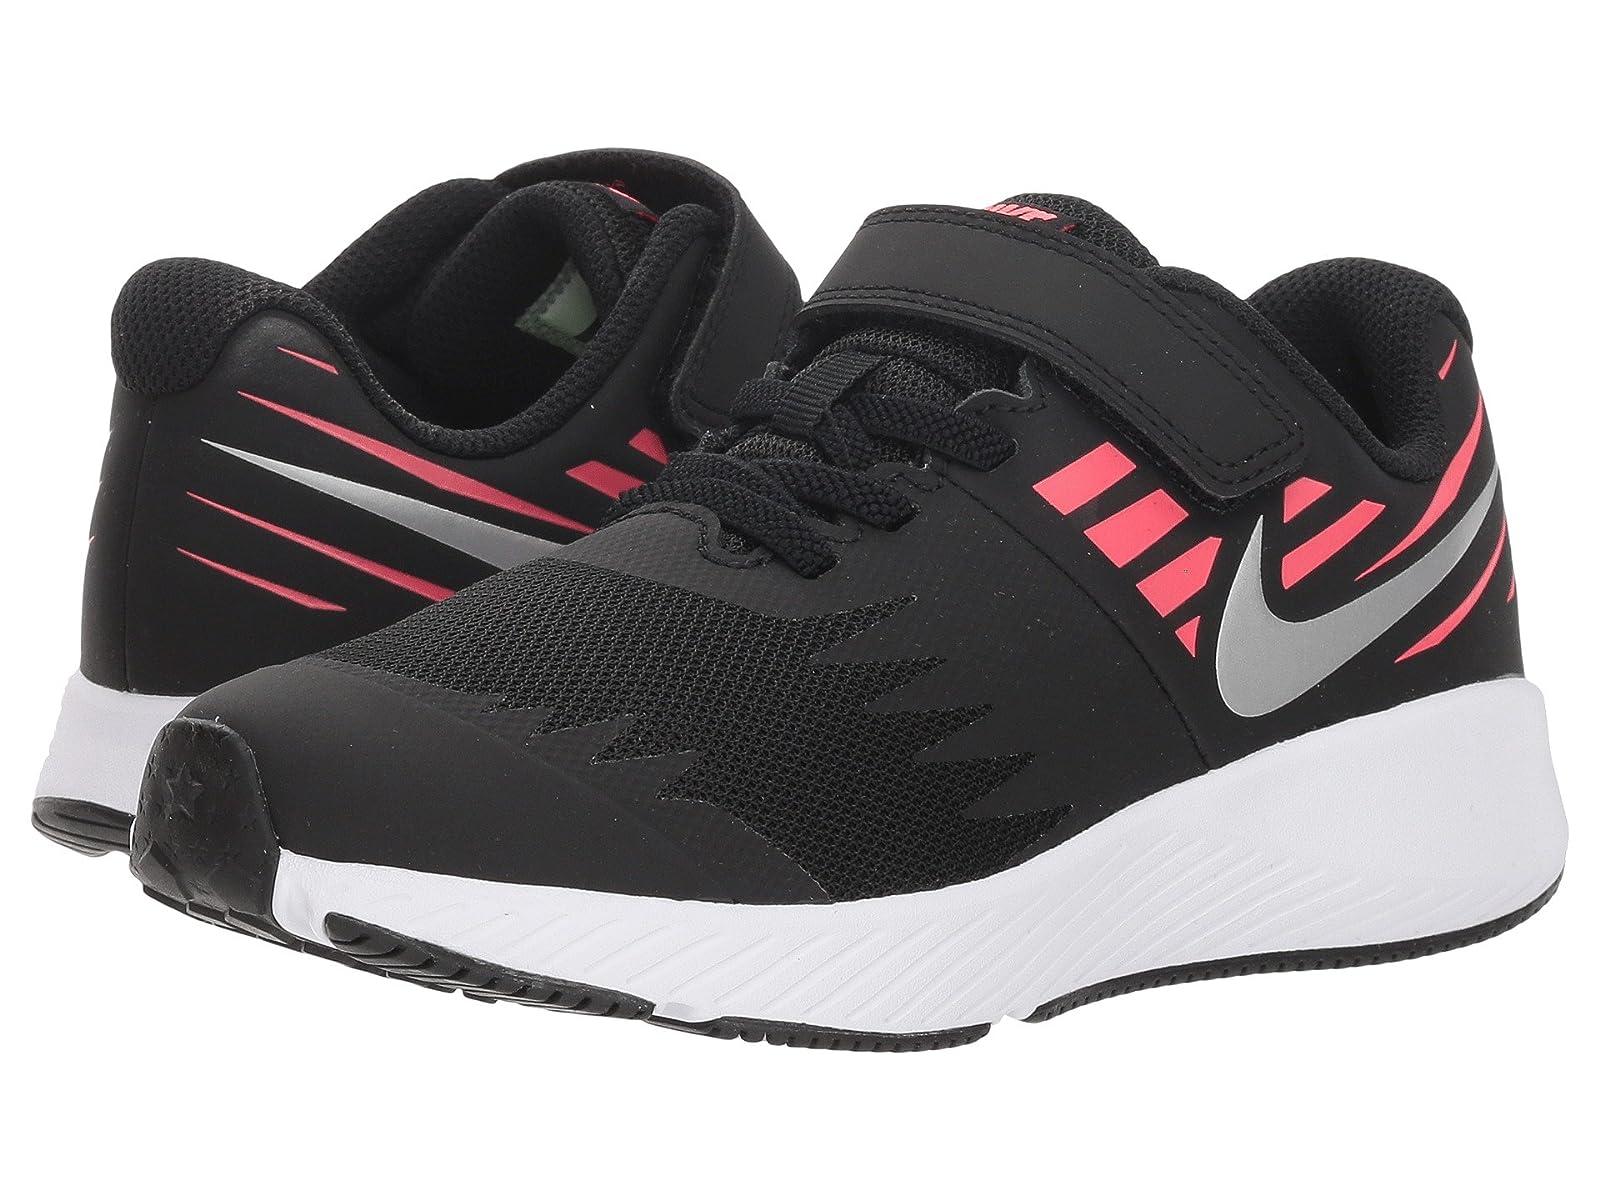 Nike Kids Star Runner (Little Kid)Atmospheric grades have affordable shoes